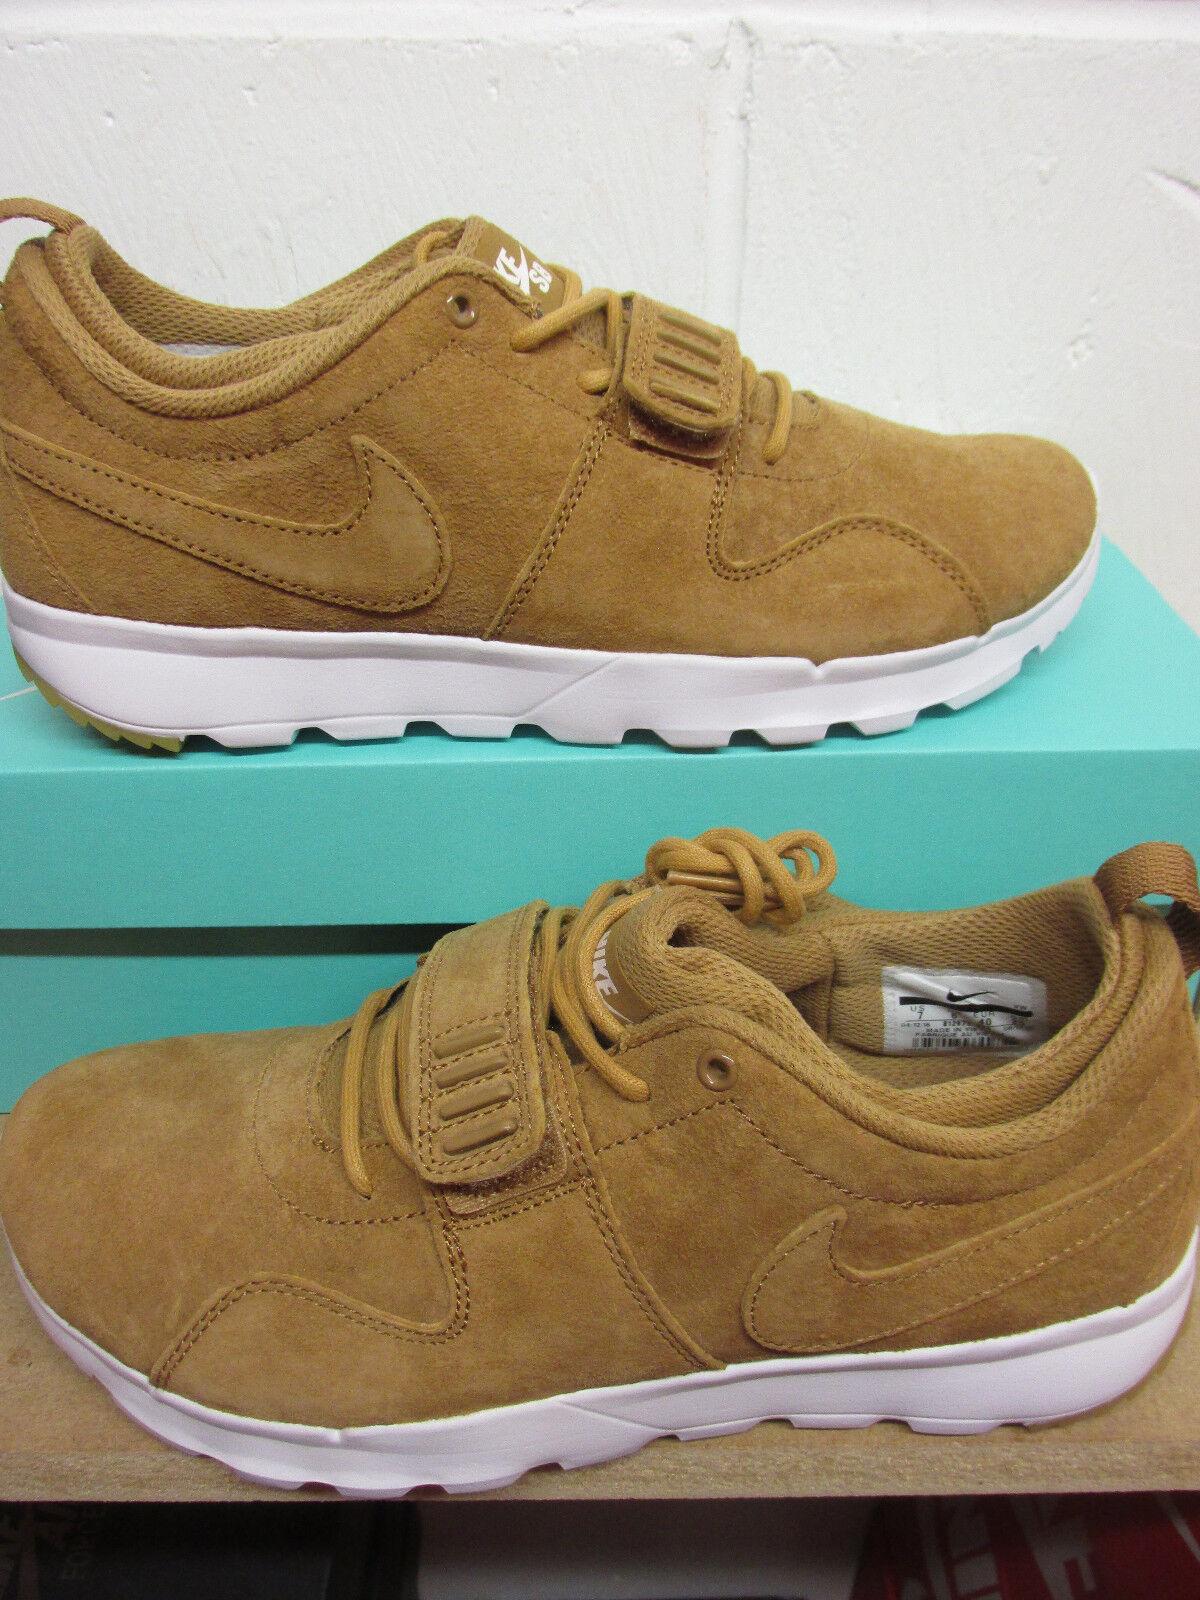 Nike Trainerendor Premium Scarpe Sportive Uomo 812975 204 Scarpe da Tennis